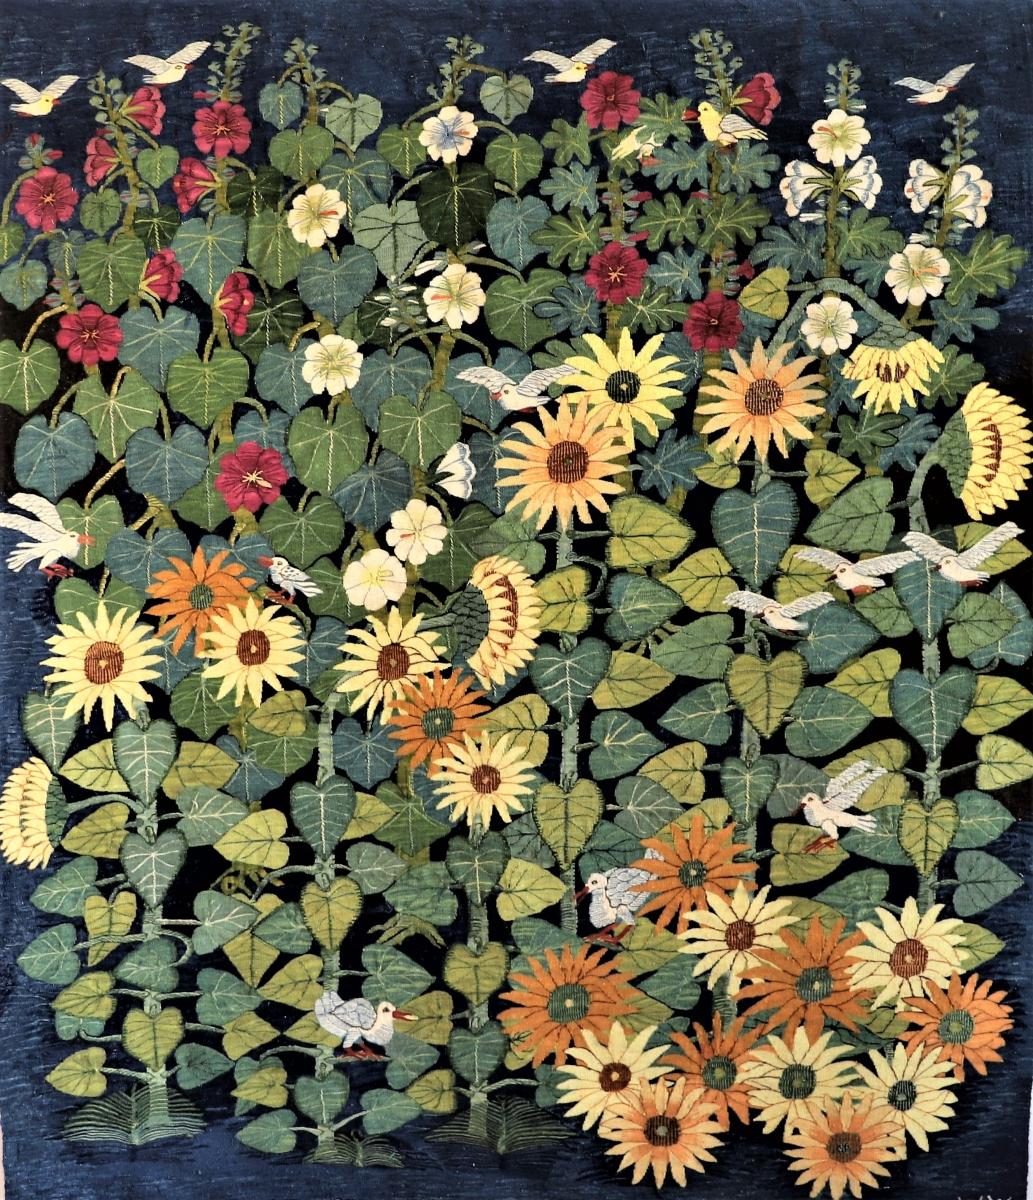 17-Sunflowers-Hollyhocks-187-2020-147-x-1.71-m-Mahrous-Abdou-1